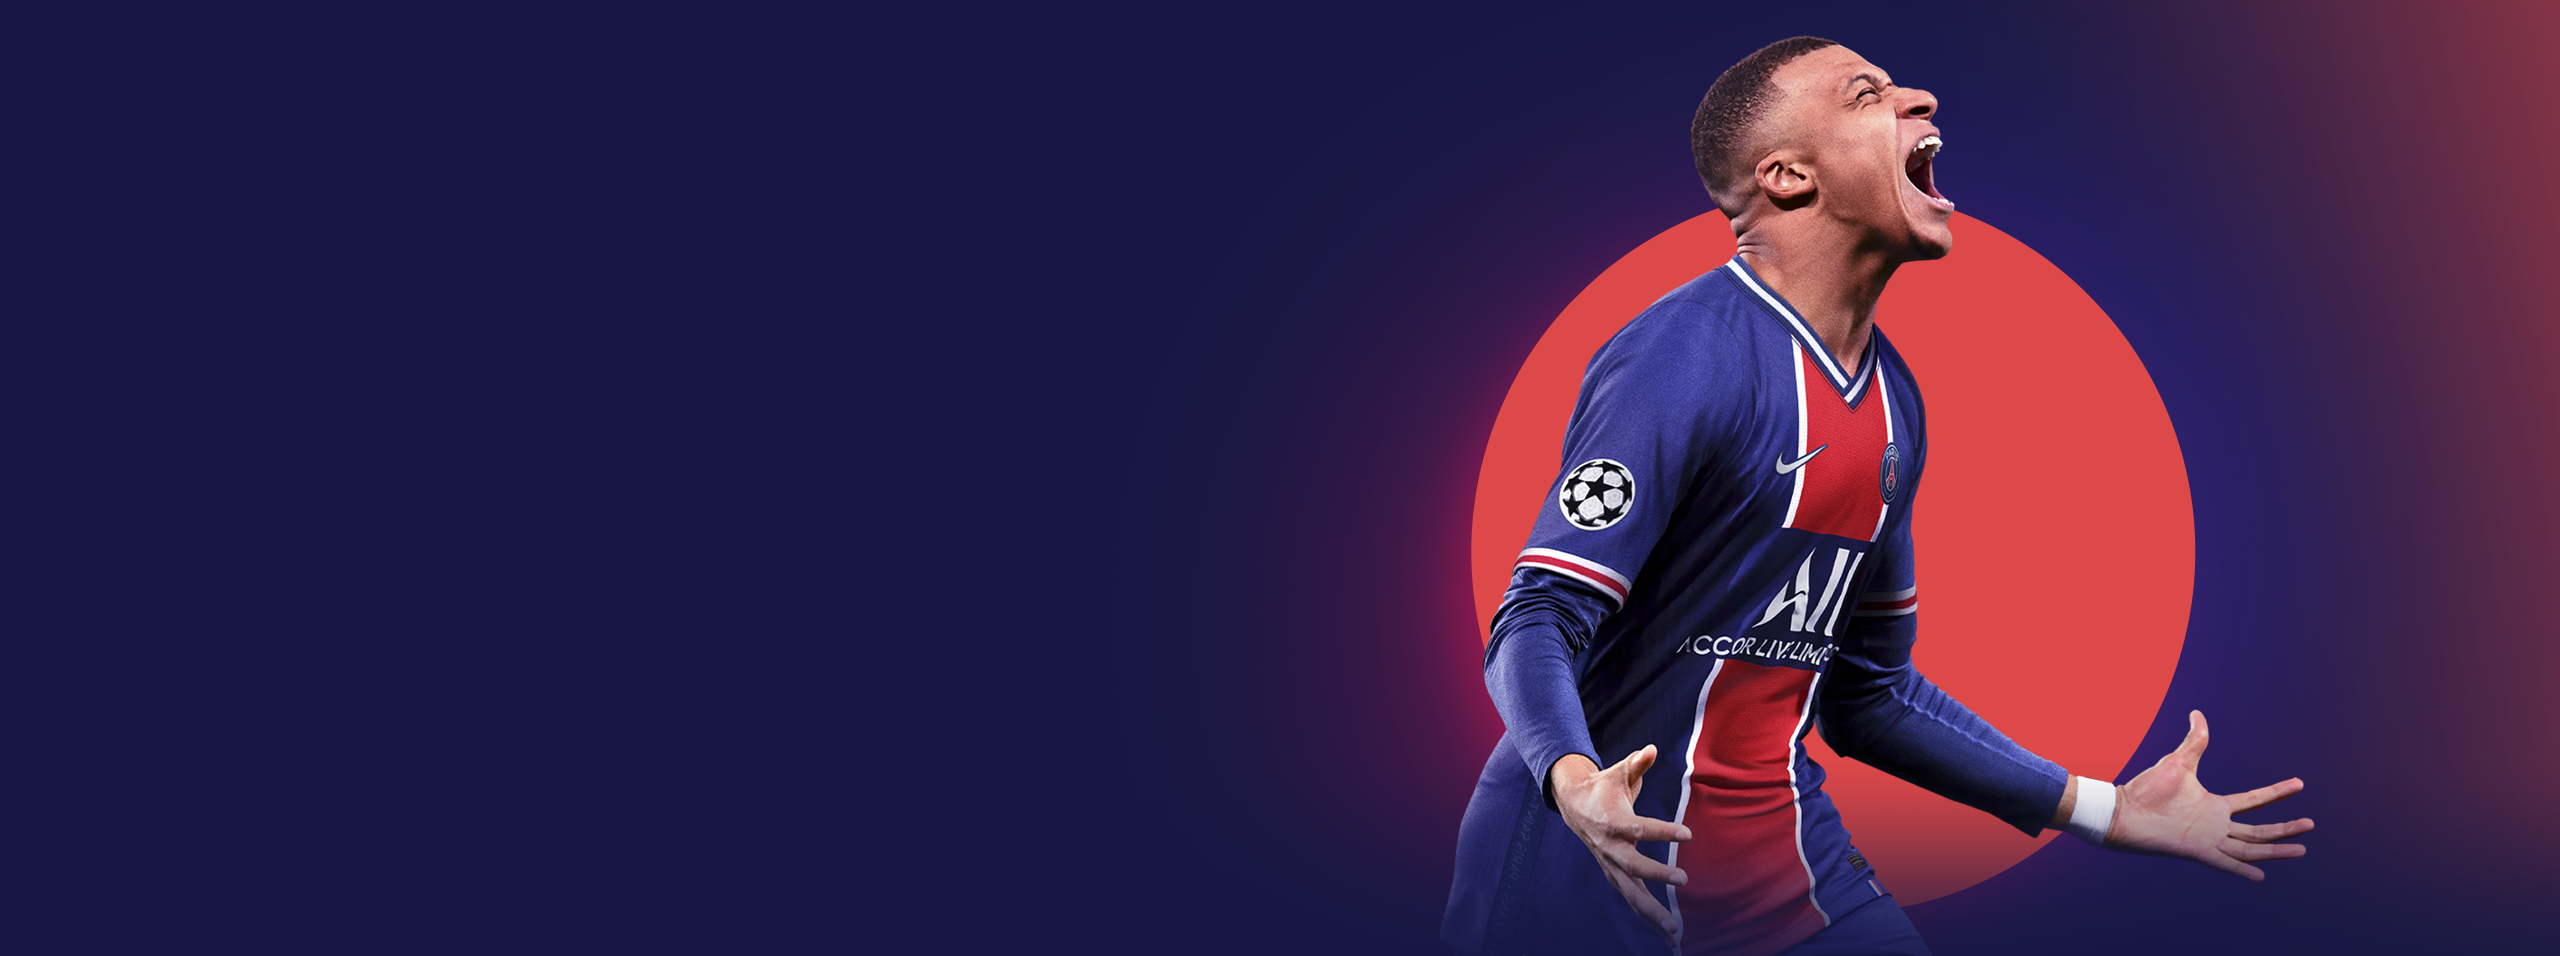 EAPlay: FIFA21 - Illustration principale